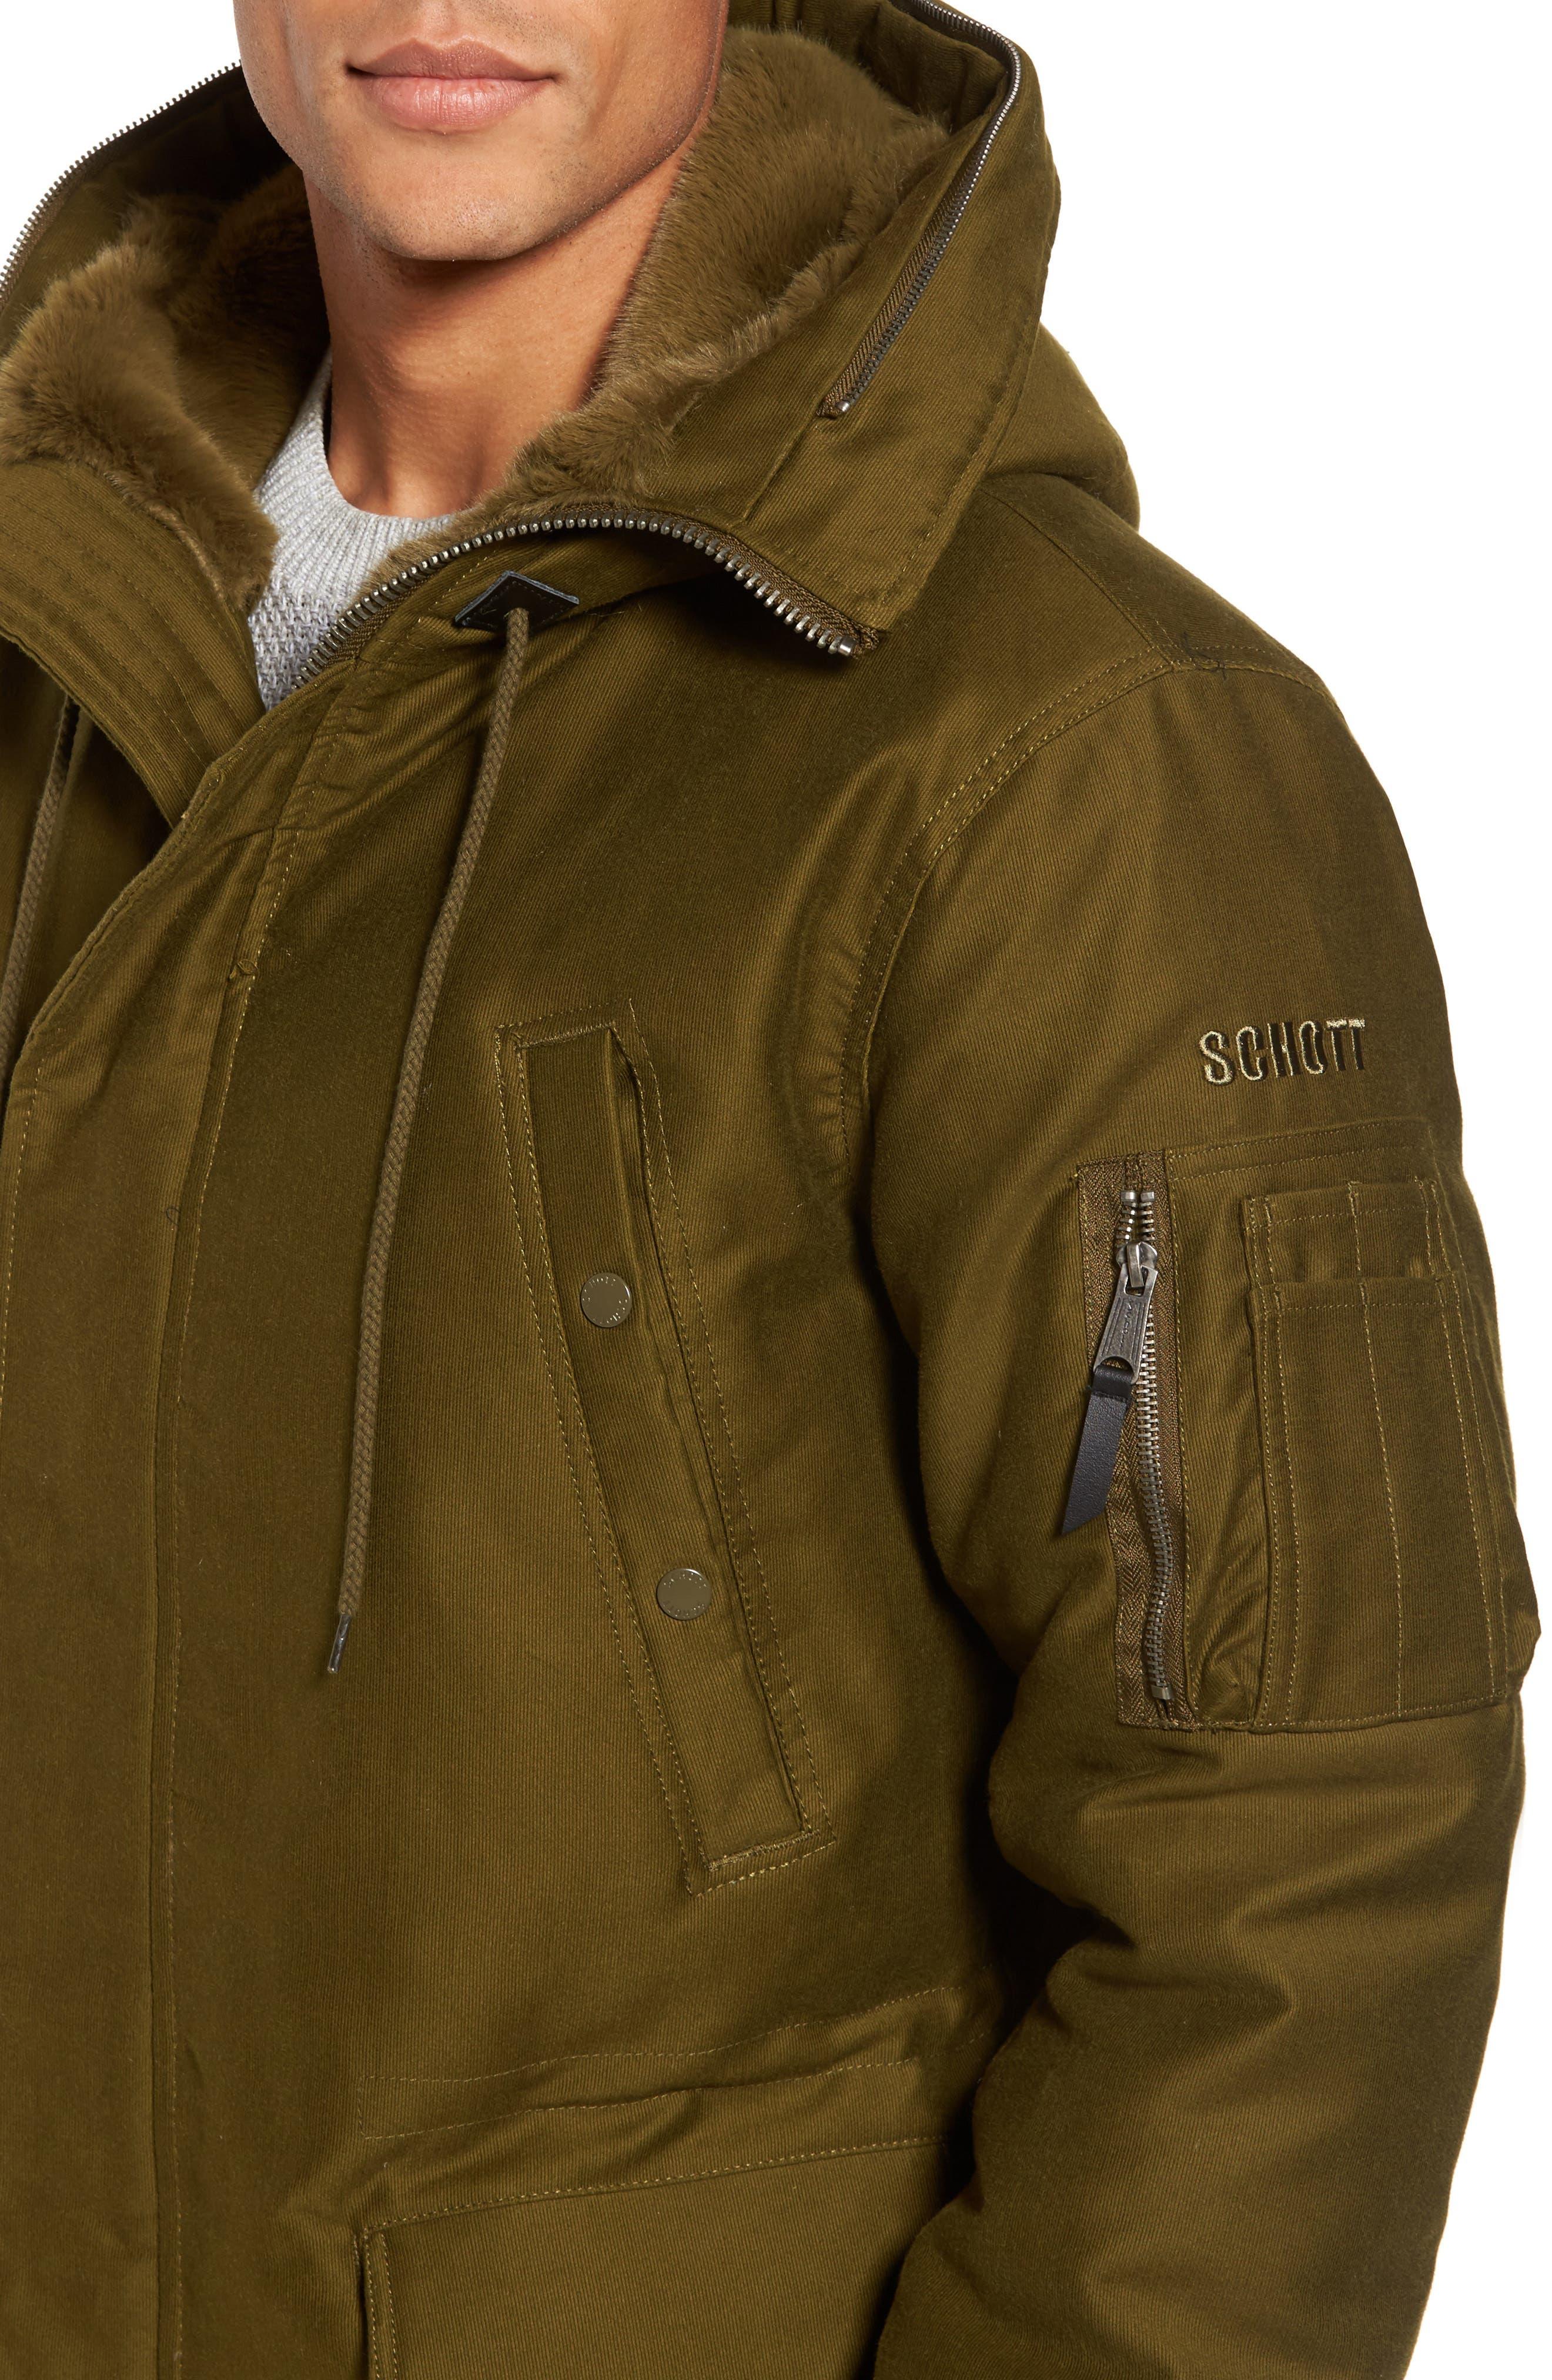 Bedford Corduroy Goose Down Jacket with Faux Fur Trim,                             Alternate thumbnail 4, color,                             352